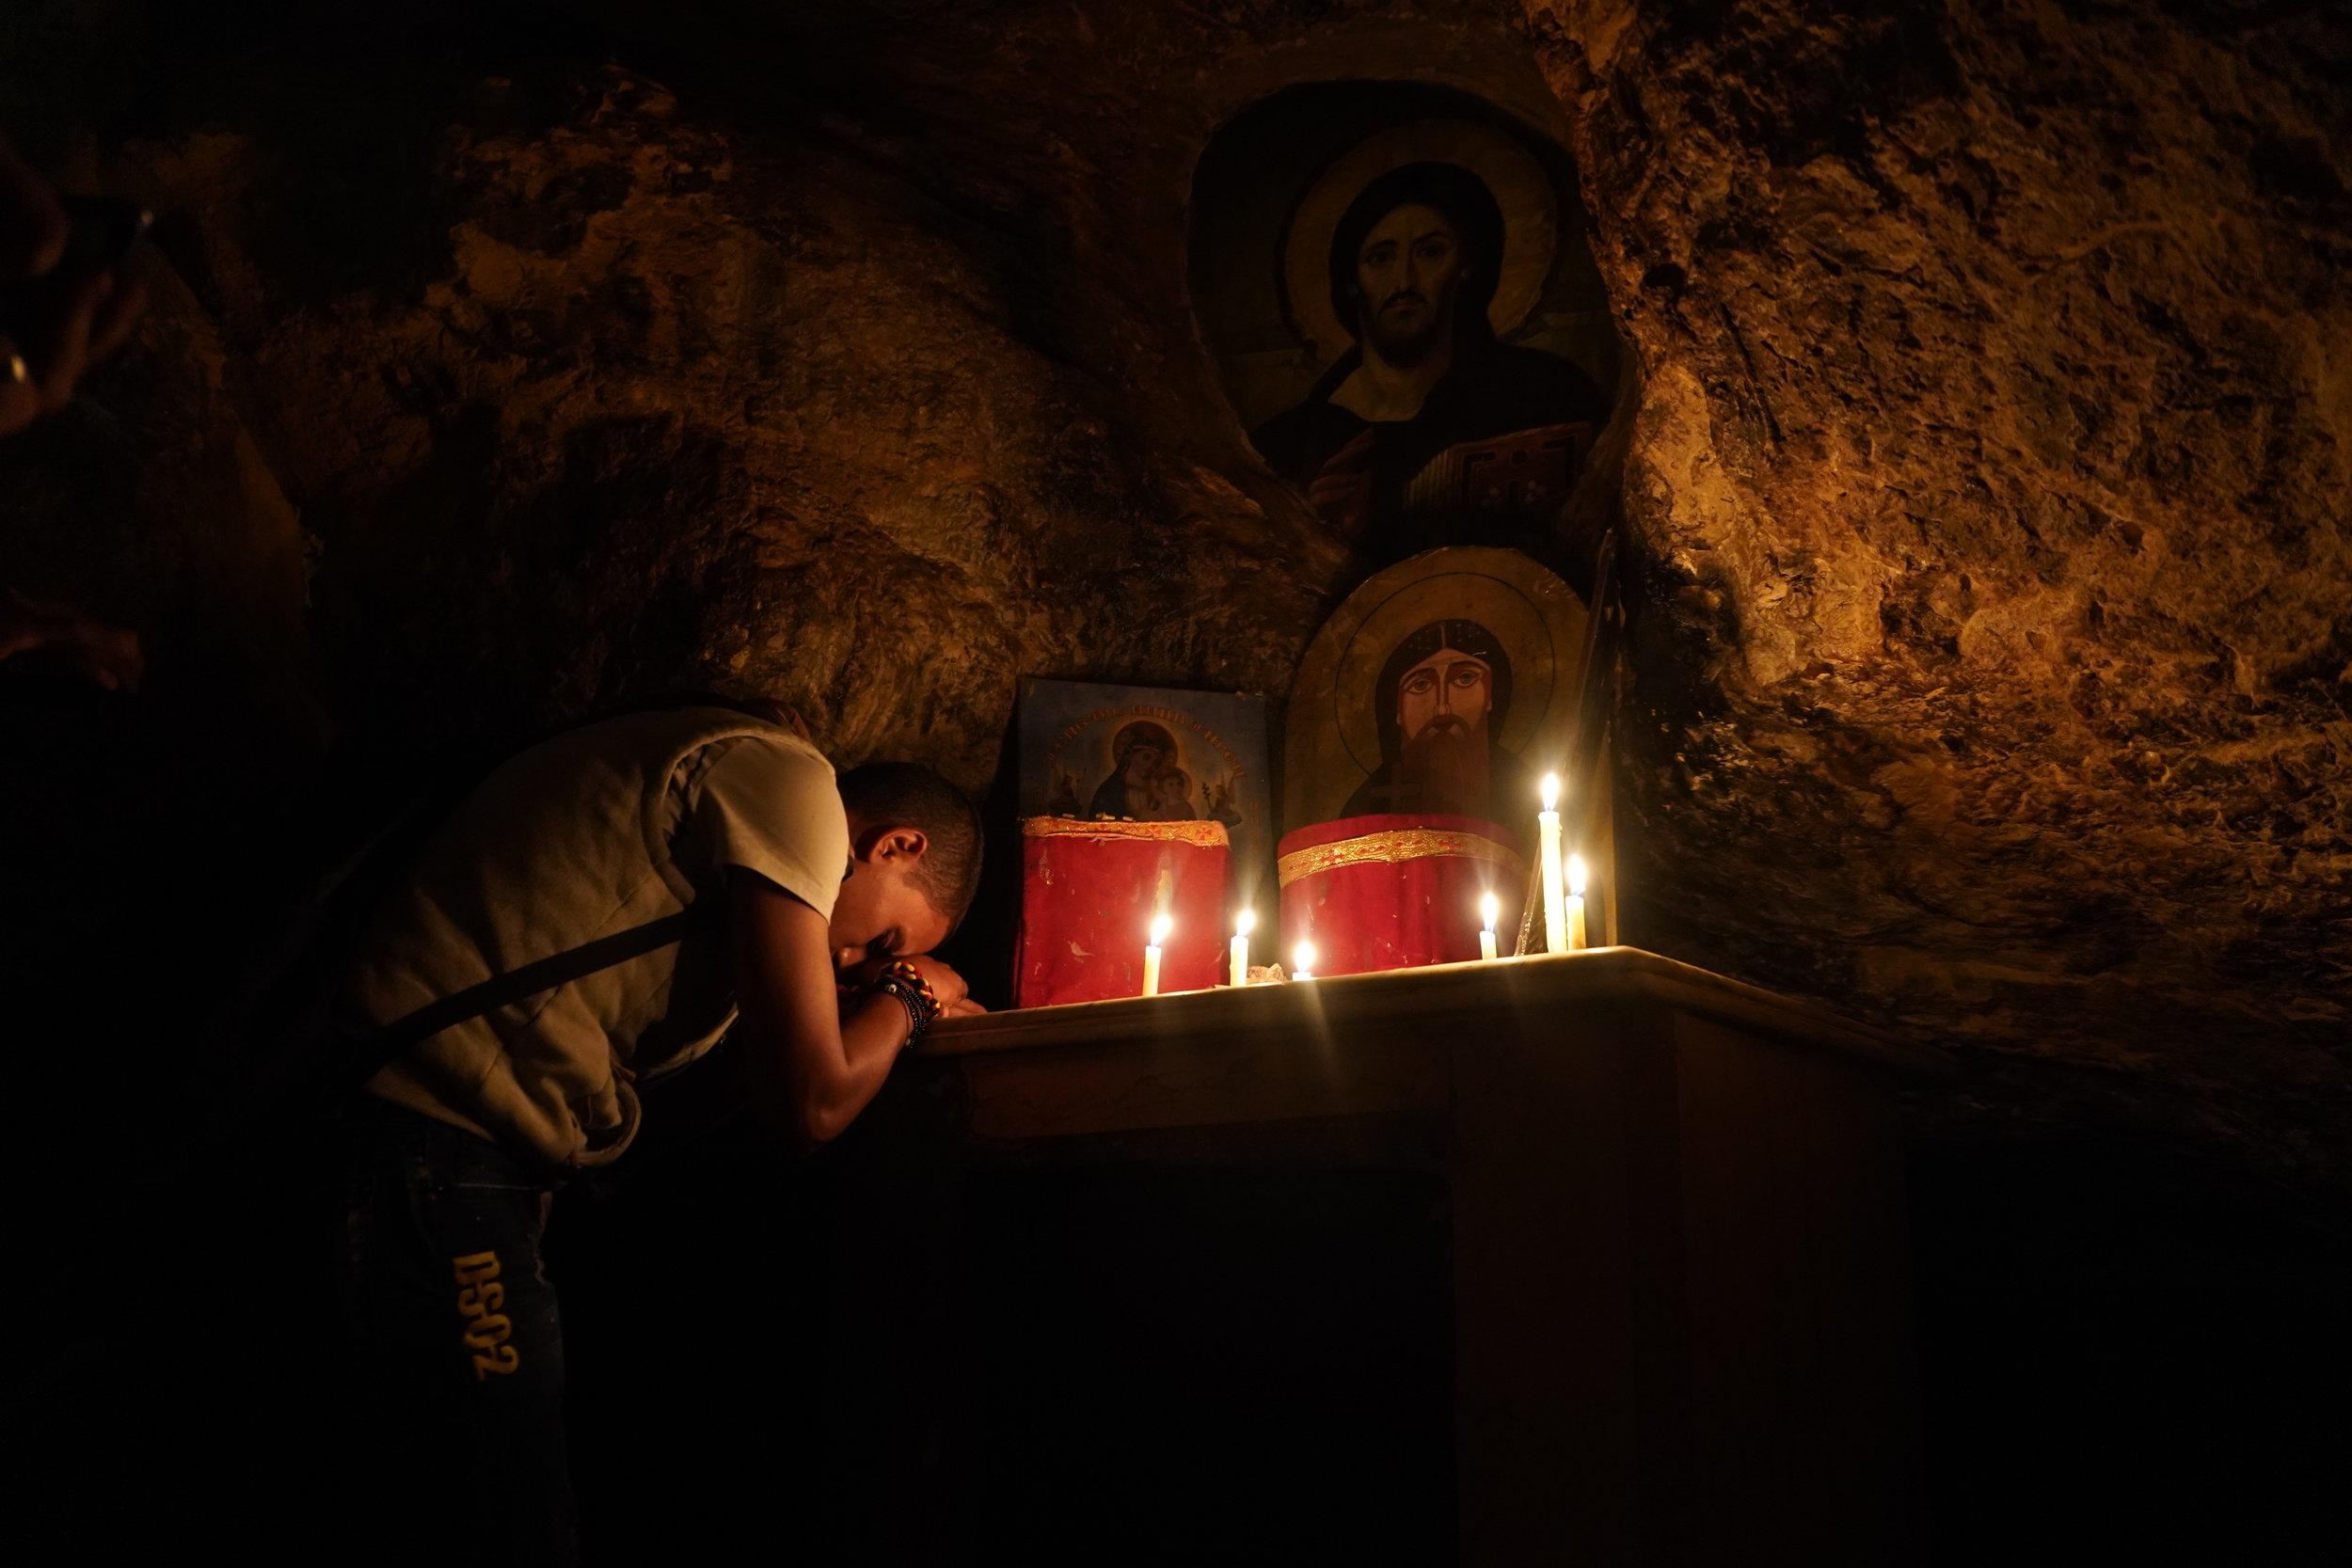 A Coptic pilgrim prays in the cave of Saint Anthony.